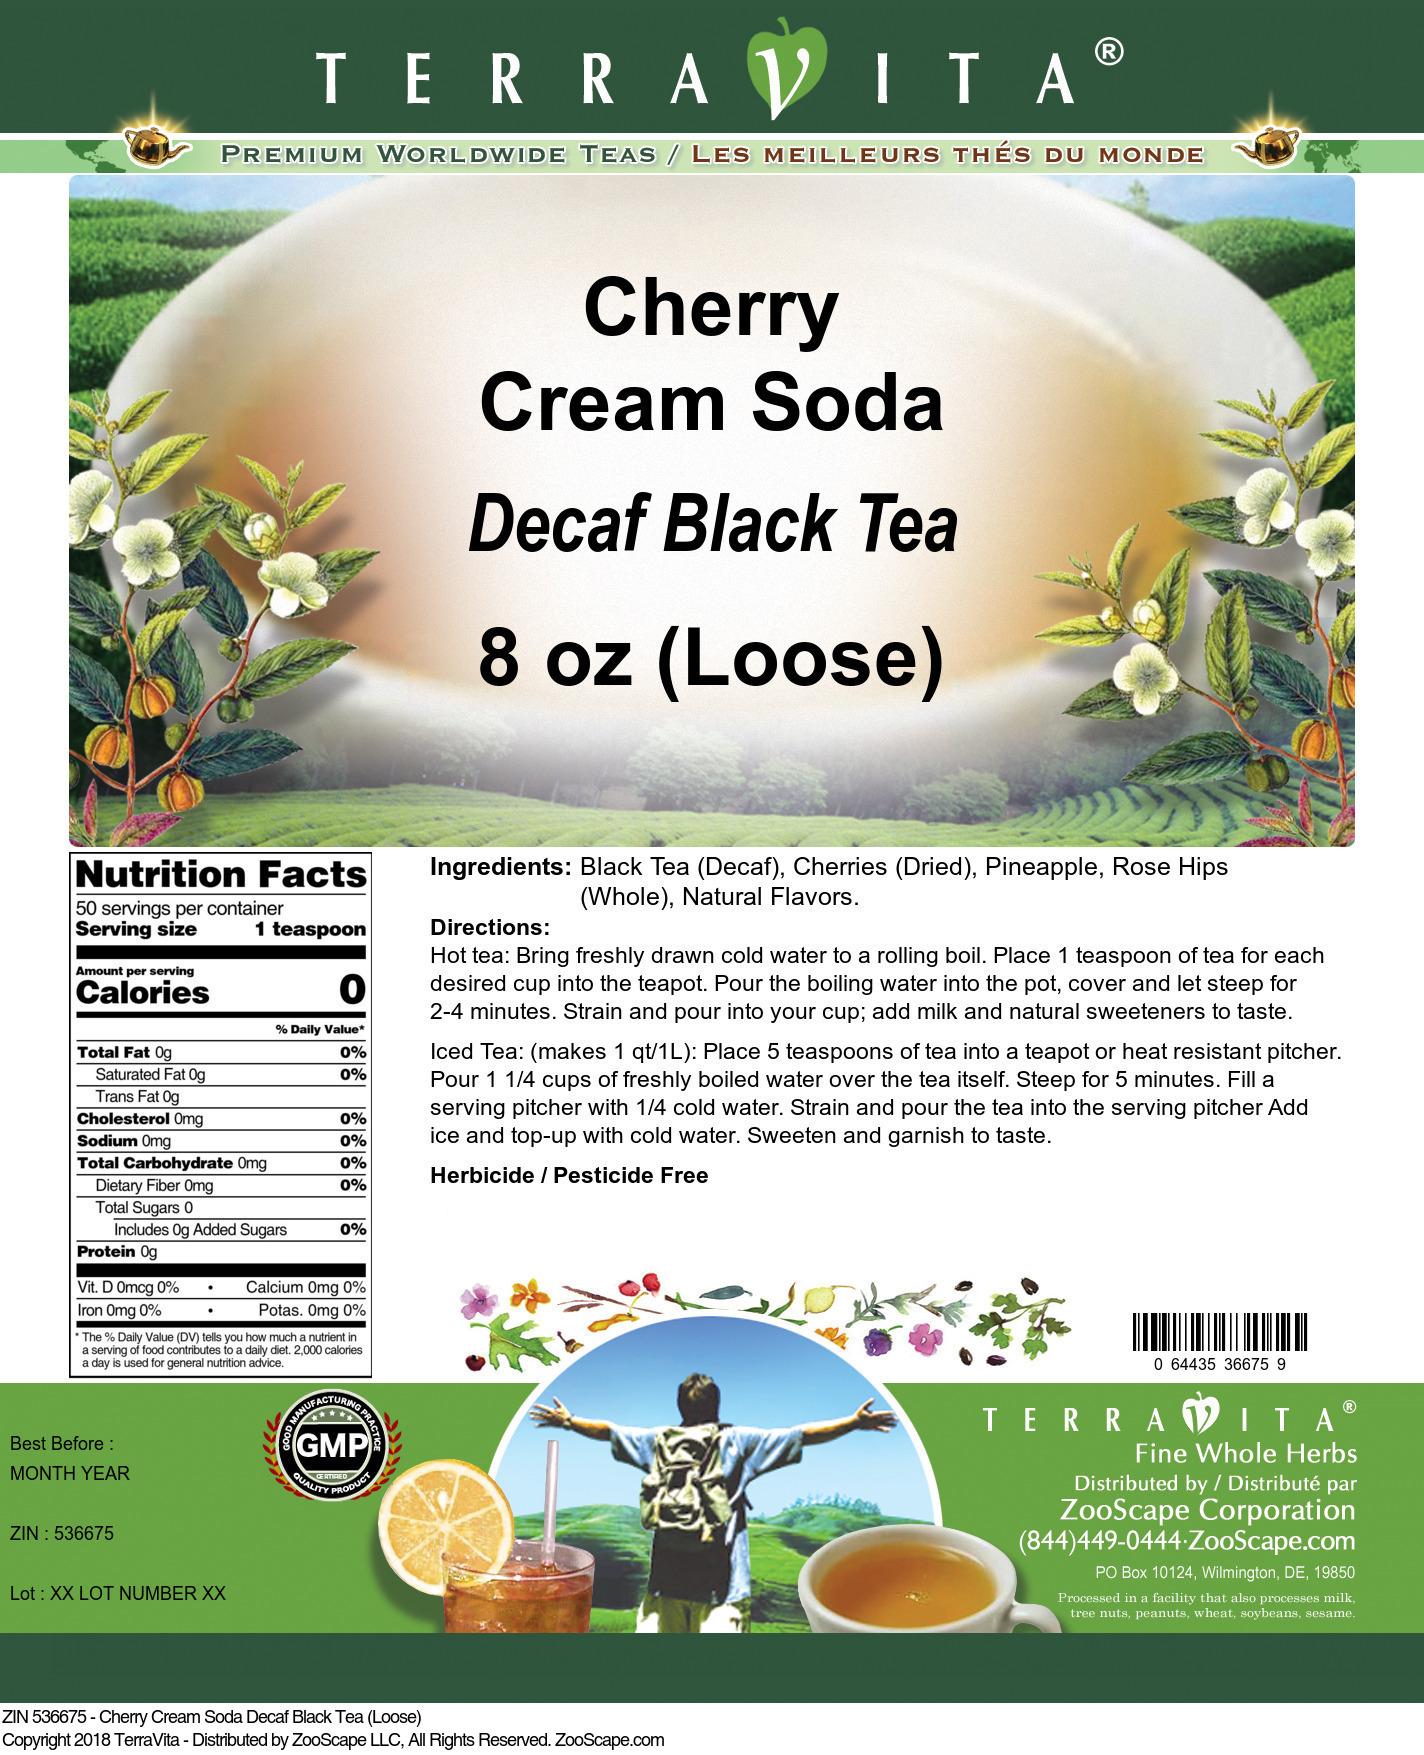 Cherry Cream Soda Decaf Black Tea